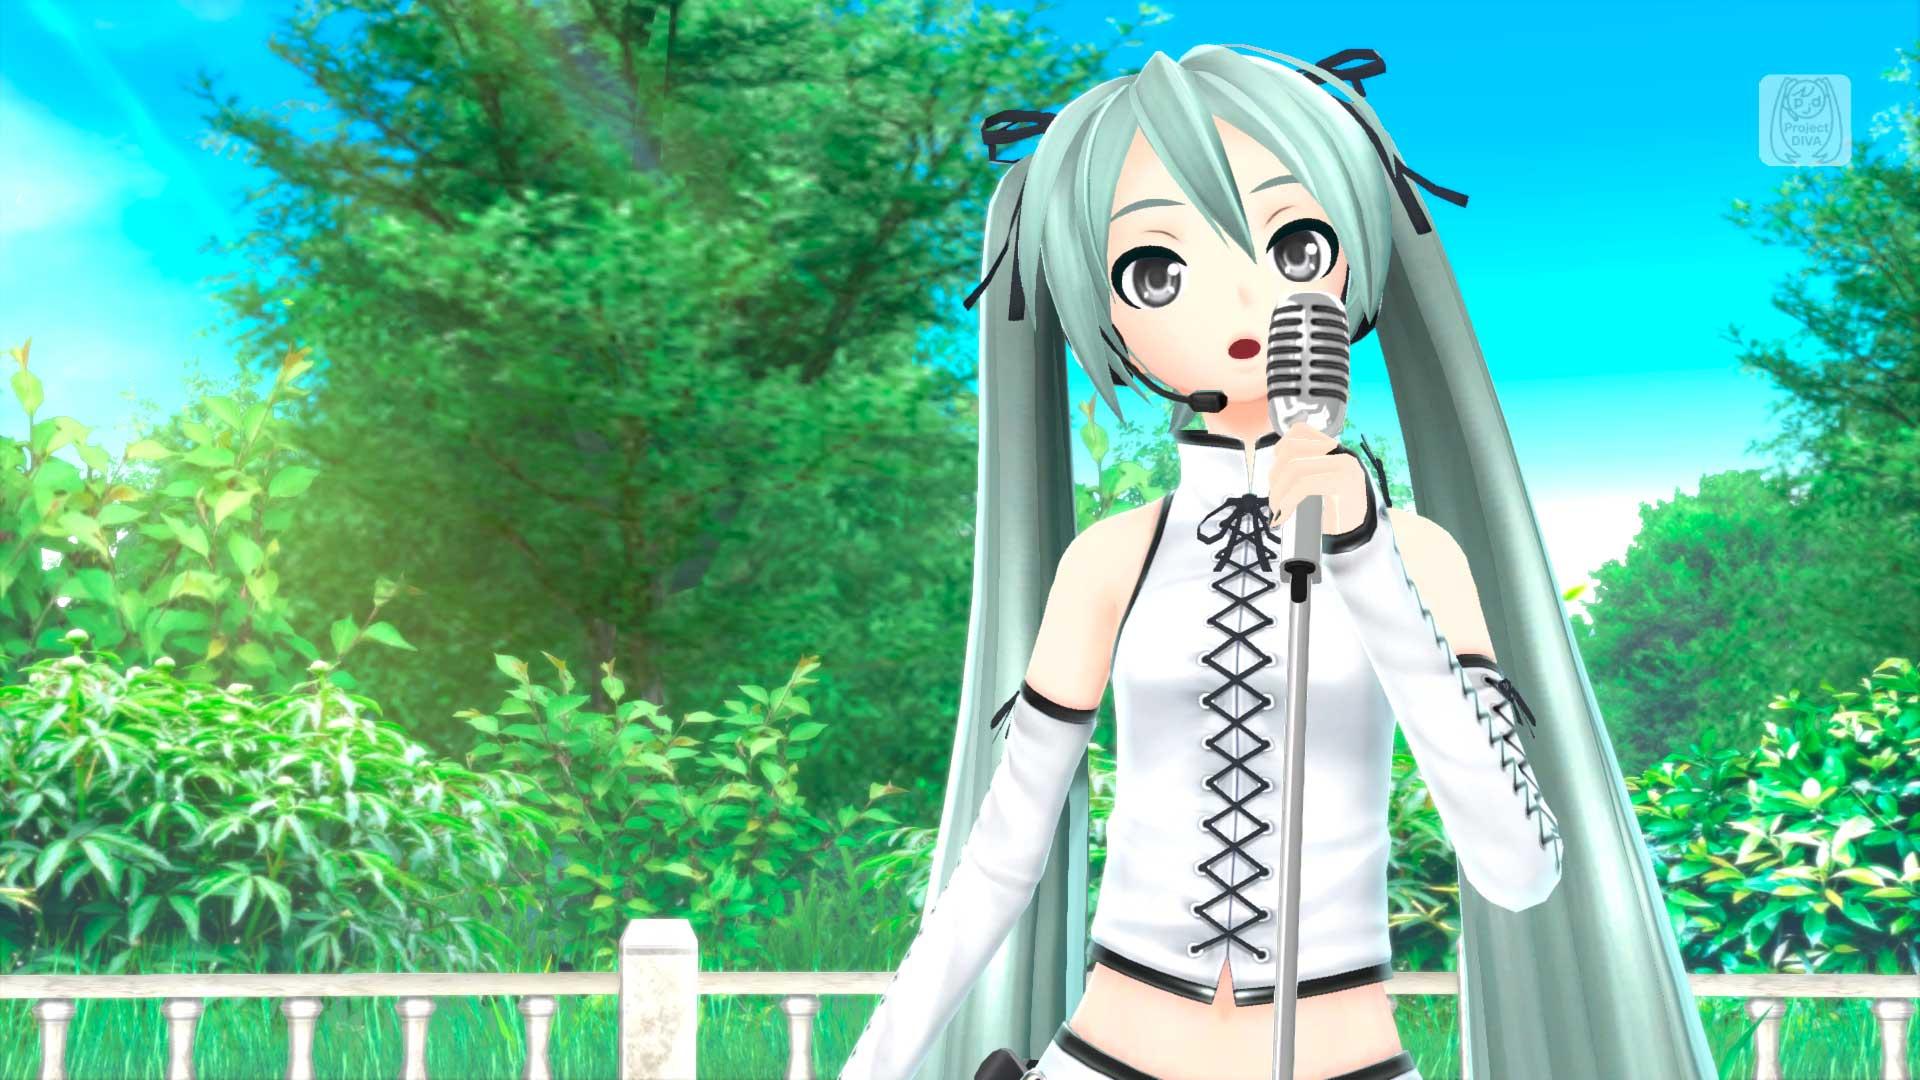 HatsuneMikuDIVAF2nd_Addon_Aliedange_PS3_SS1_1425409226